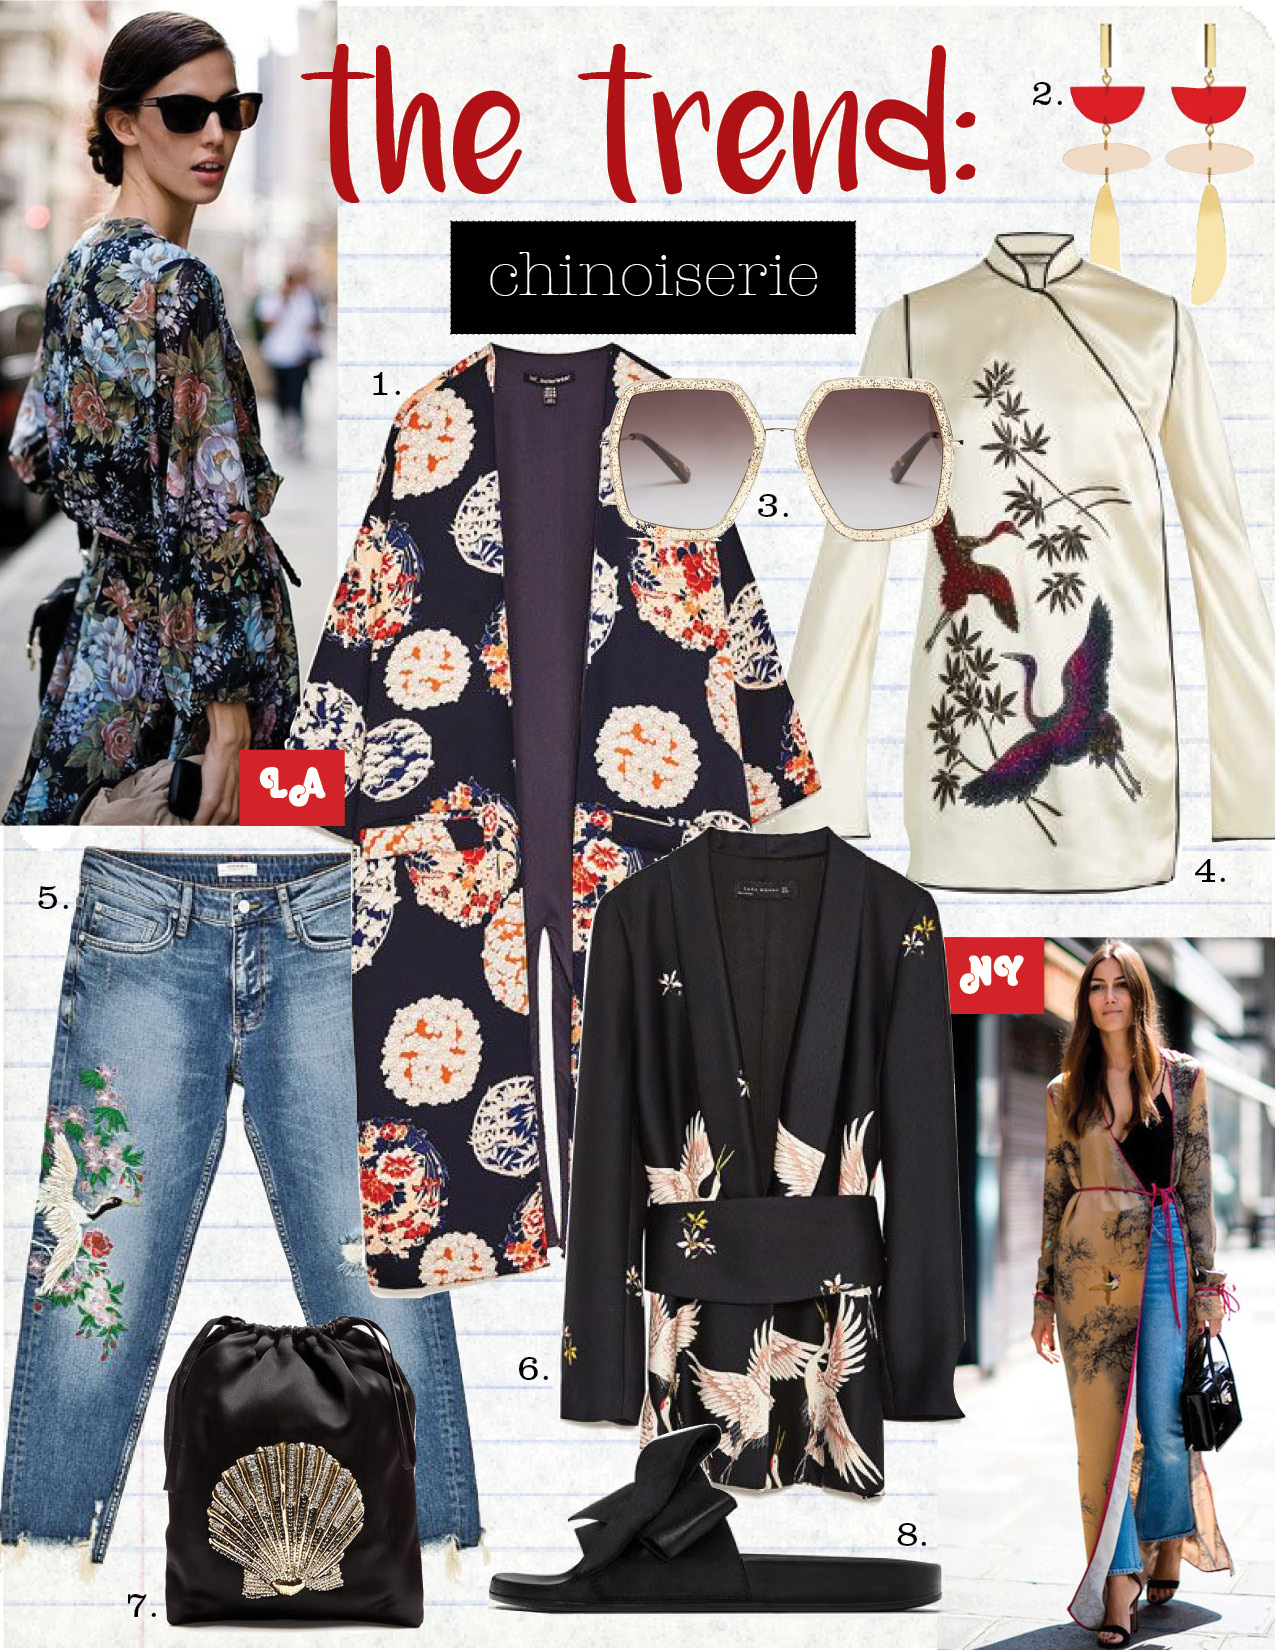 1. zara printed kimono jacket, $69,  zara.com  2. isabel Marant other potatoes drop earrings, $245,  matchesfashion.com  3. gucci oversized hexagon-frame sunglasses, $260,  matchesfashion.com  4. attico elena heron-embellished satin kimono dress, $1769,  matchesfashion.com  5. zara mid-rise boyfriend jean, $69,  zara.com  6. zara printed jacket with sash belt, $149,  zara.com  7. attico sofia seashell-embroidered satin pouch, $392,  matchesfashion.com  8. zara satin bow slides, $39,  zara.com